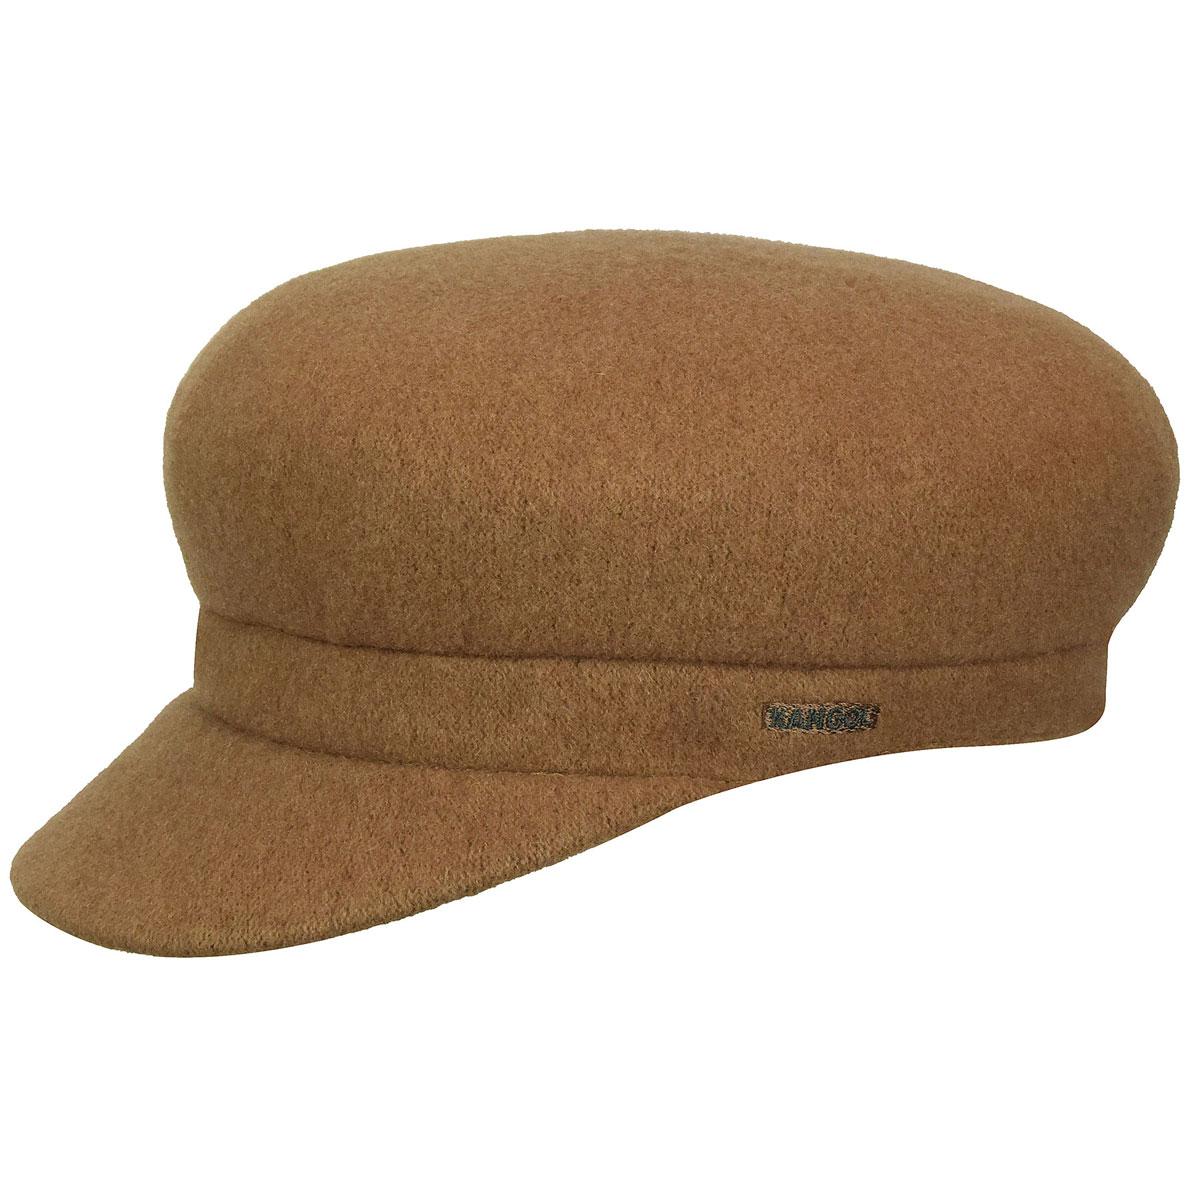 1960s – 70s Style Men's Hats Wool Enfield $61.00 AT vintagedancer.com